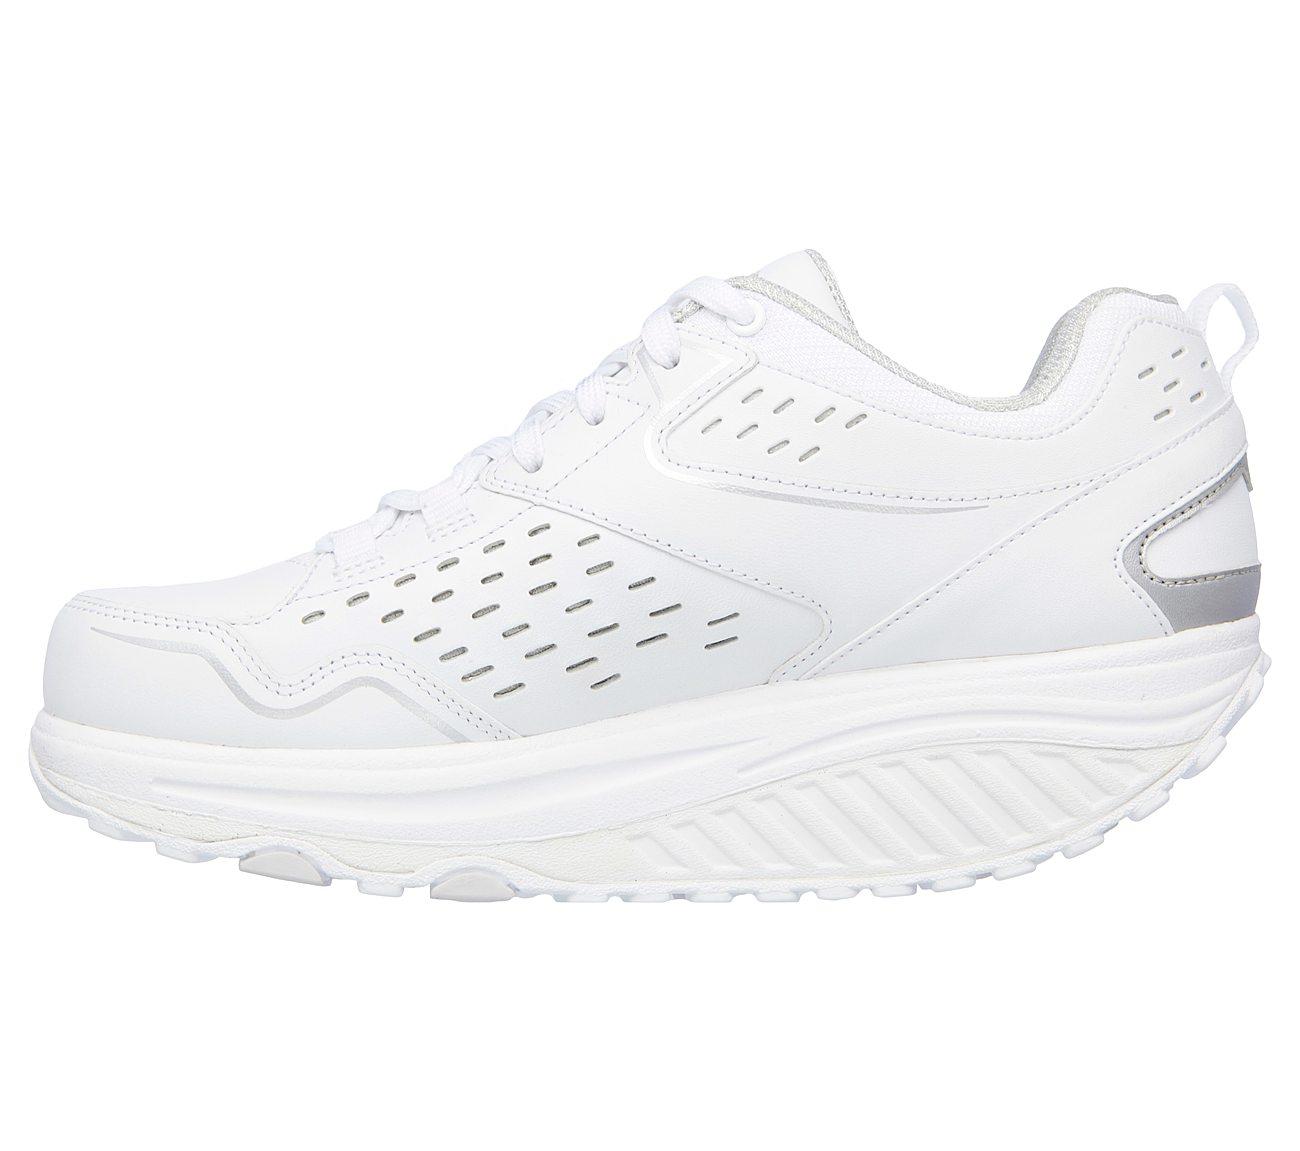 Perfect Comfort SKECHERS Shape-ups Shoes